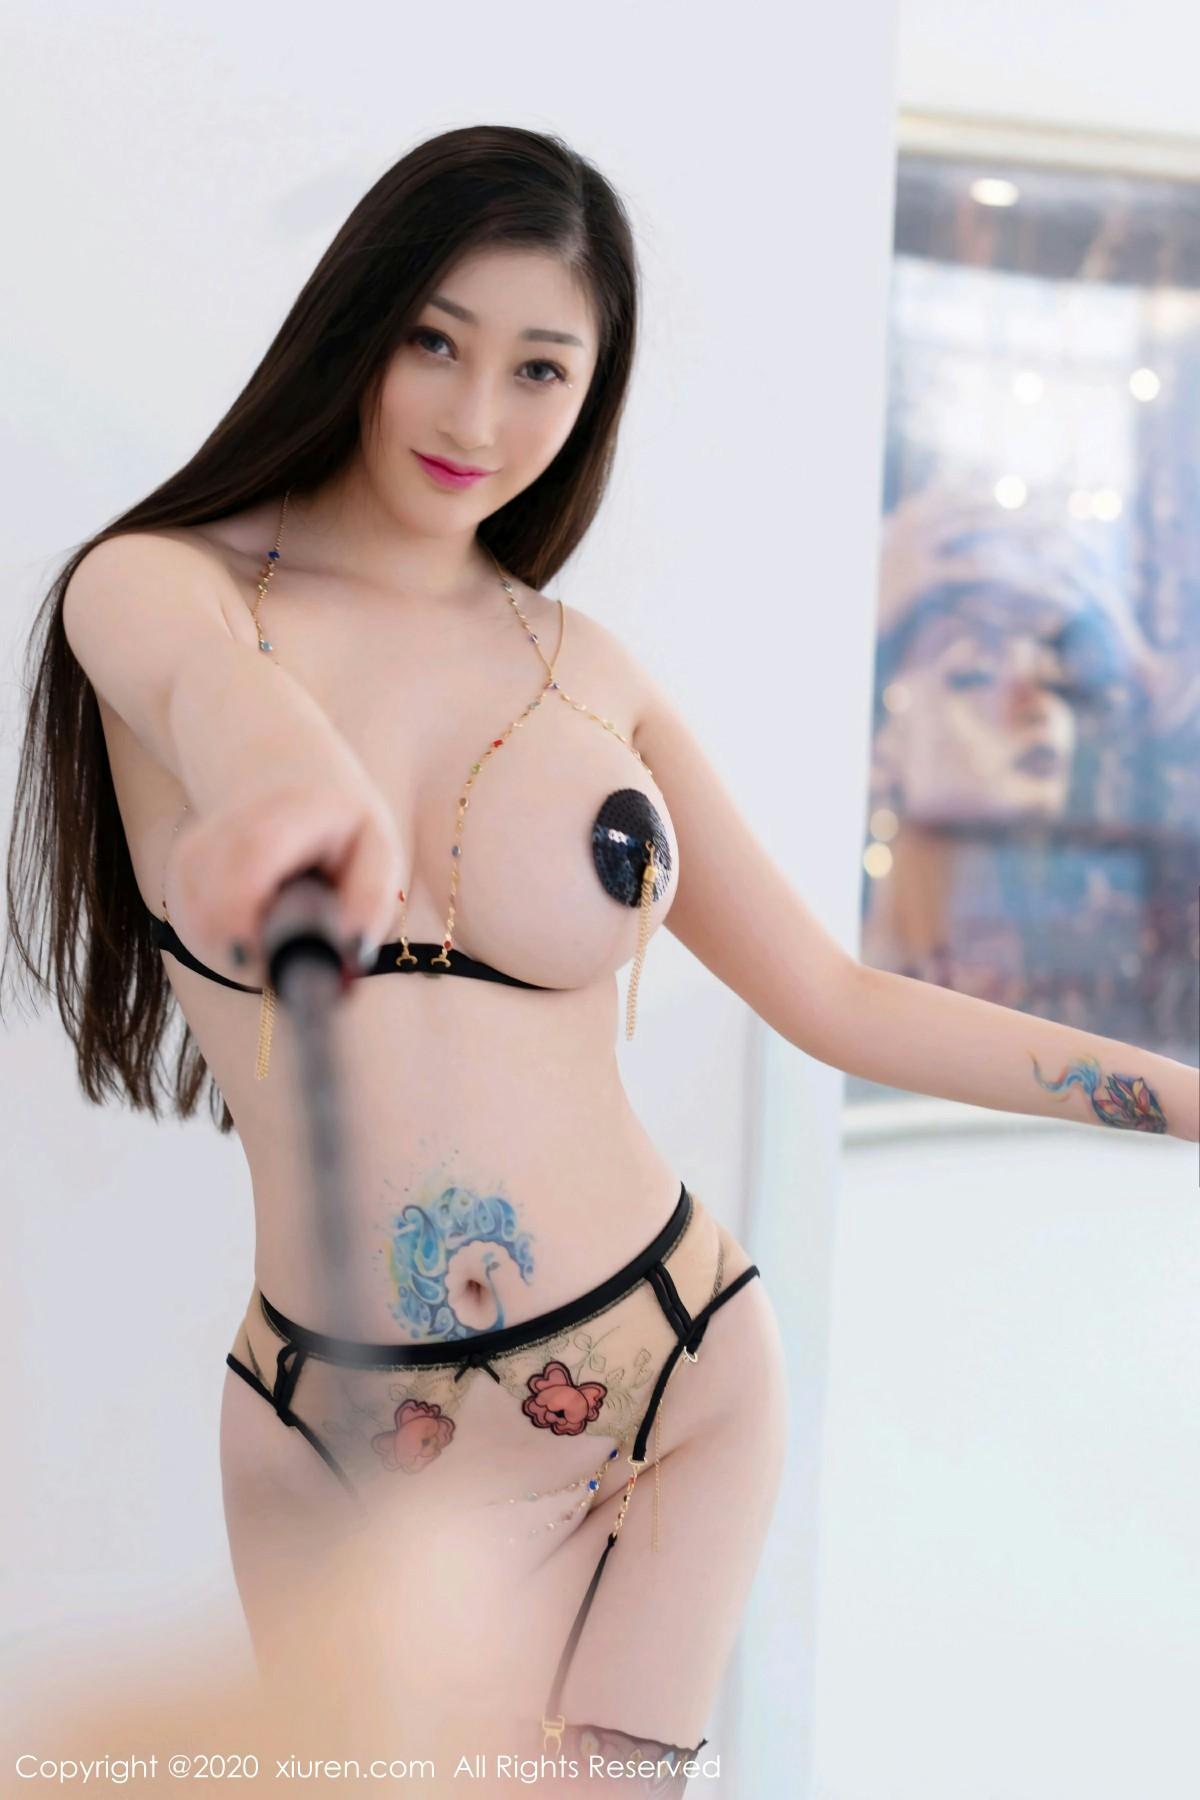 [XiuRen秀人网]2020.03.26 No.2104 妲己 Toxic[35P] 秀人网 第4张